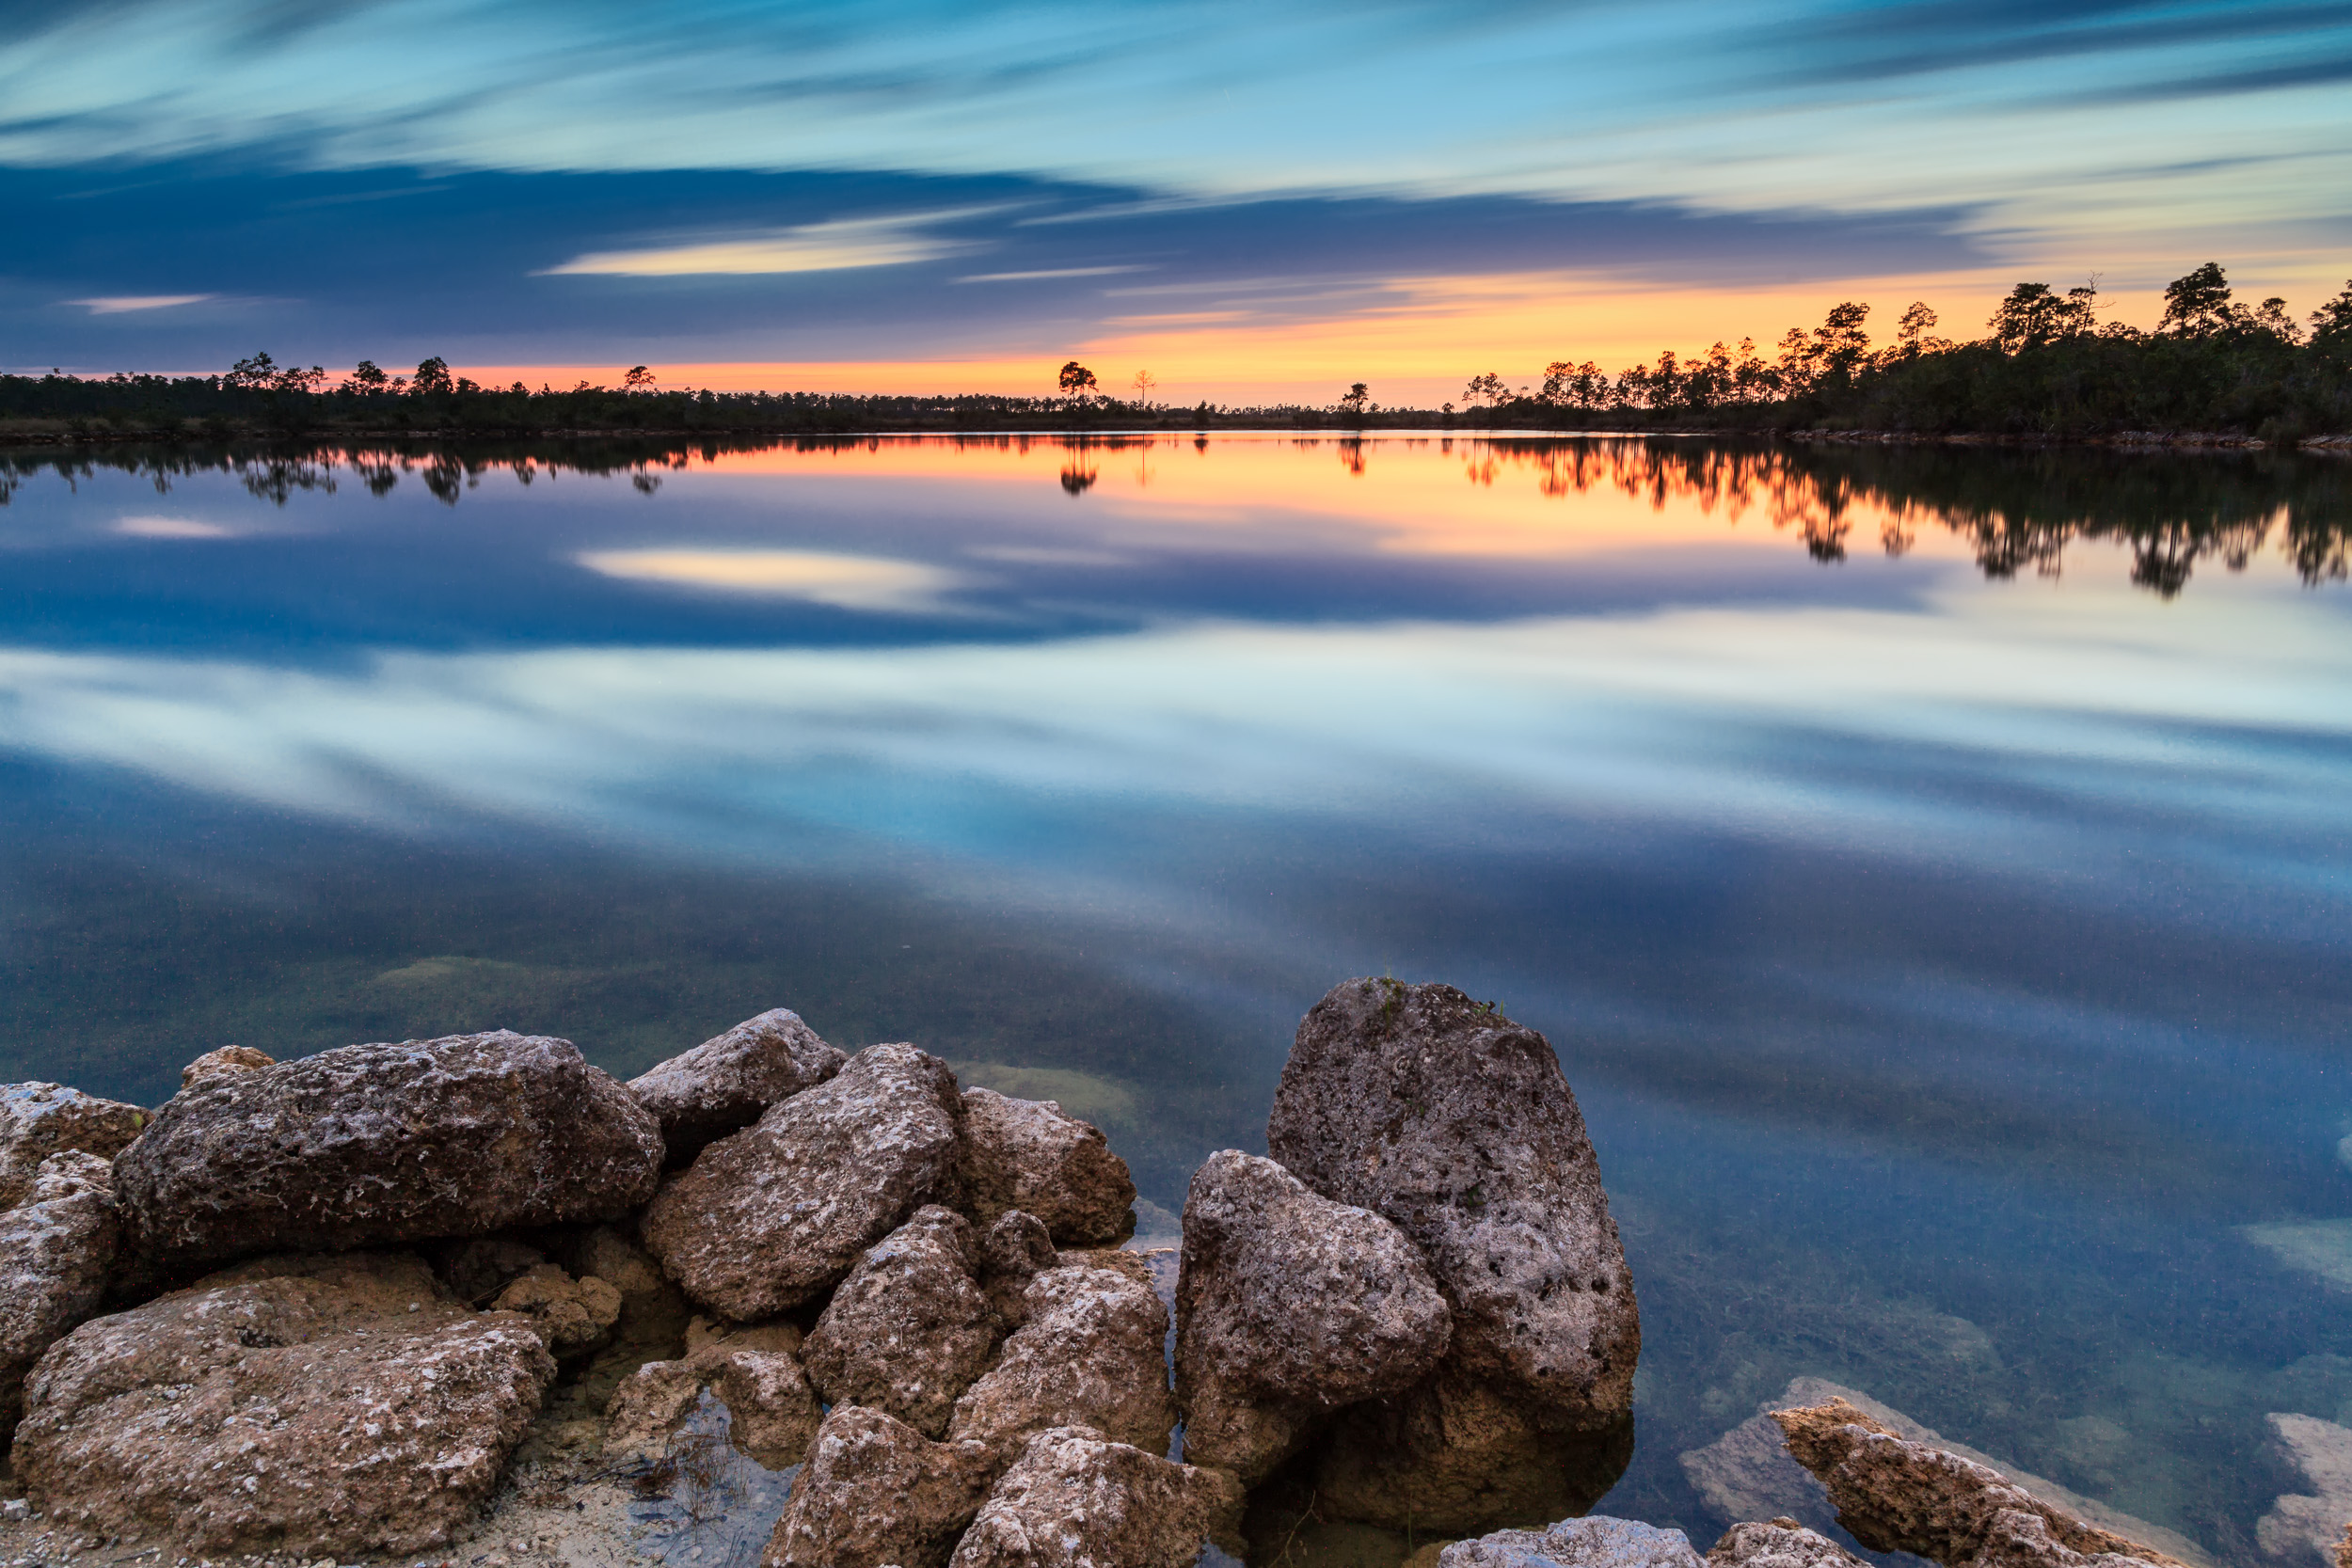 Pine_Glades_lake_sunset_Miami_Fort_Lauderdale_commercial_photographer_Franklin_Castillo.jpg